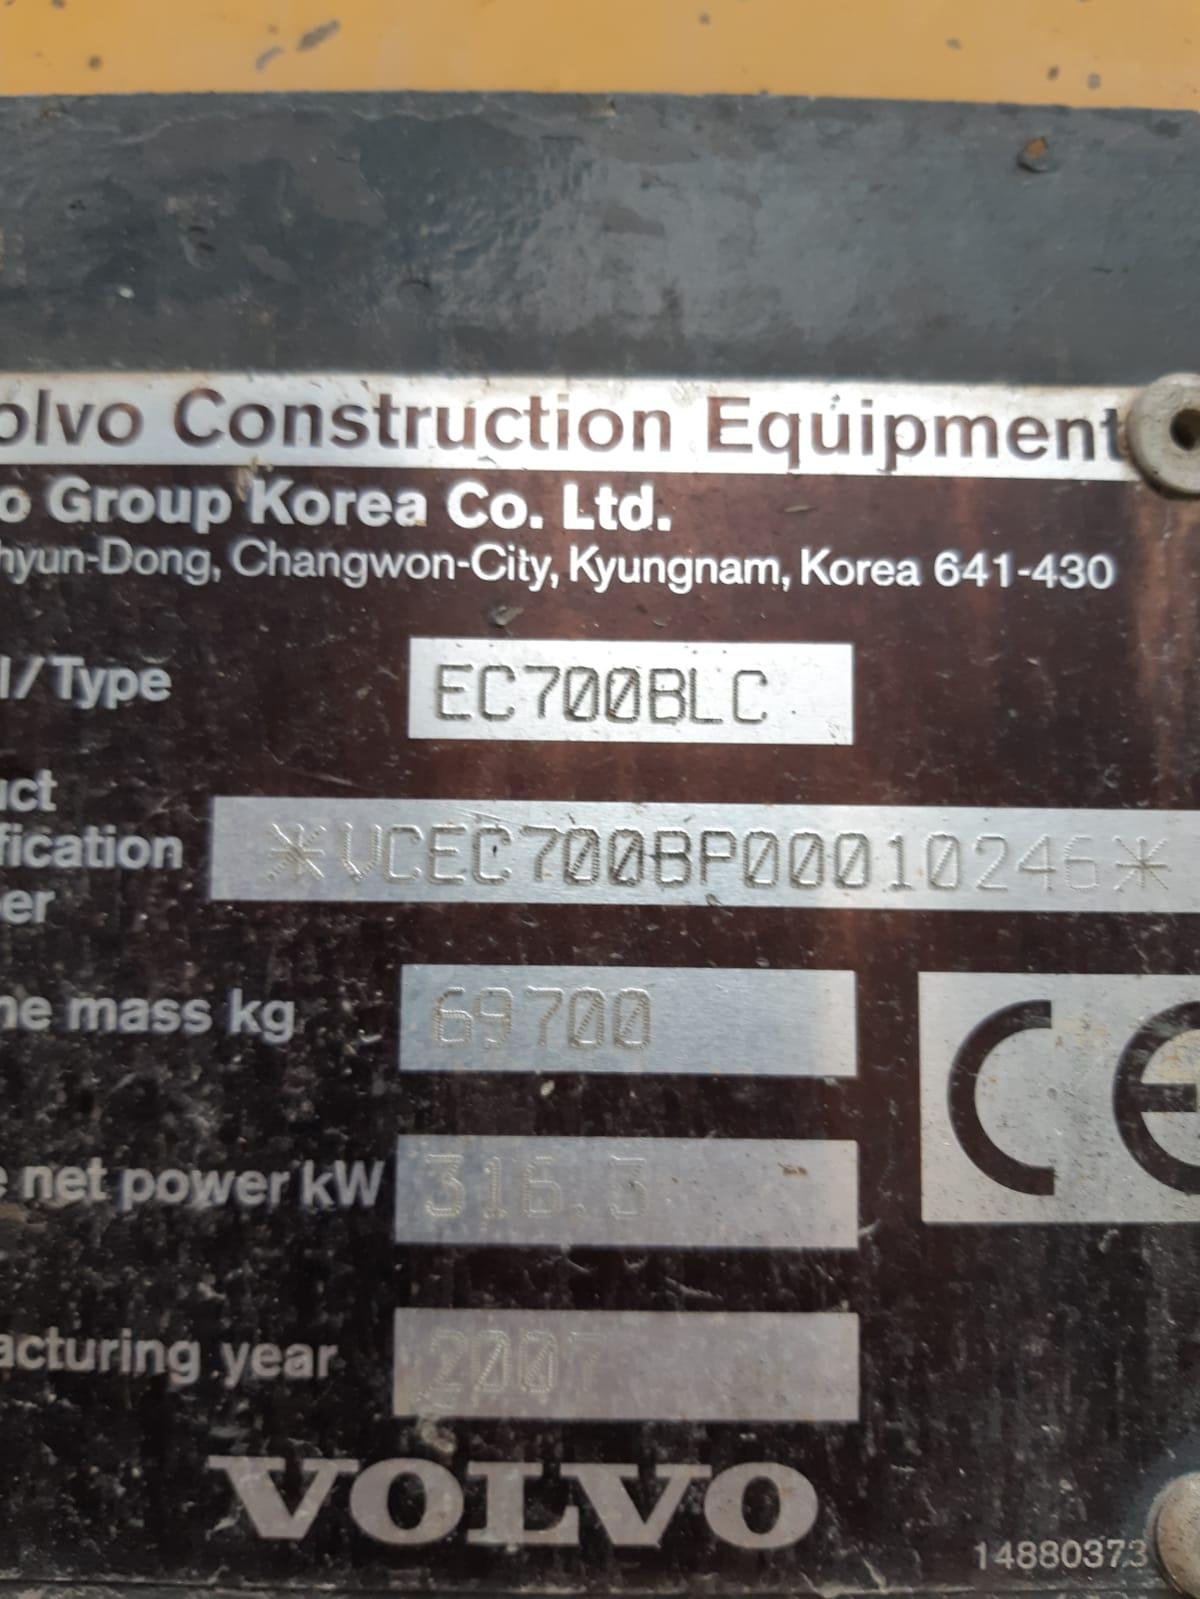 VOLVO EC700